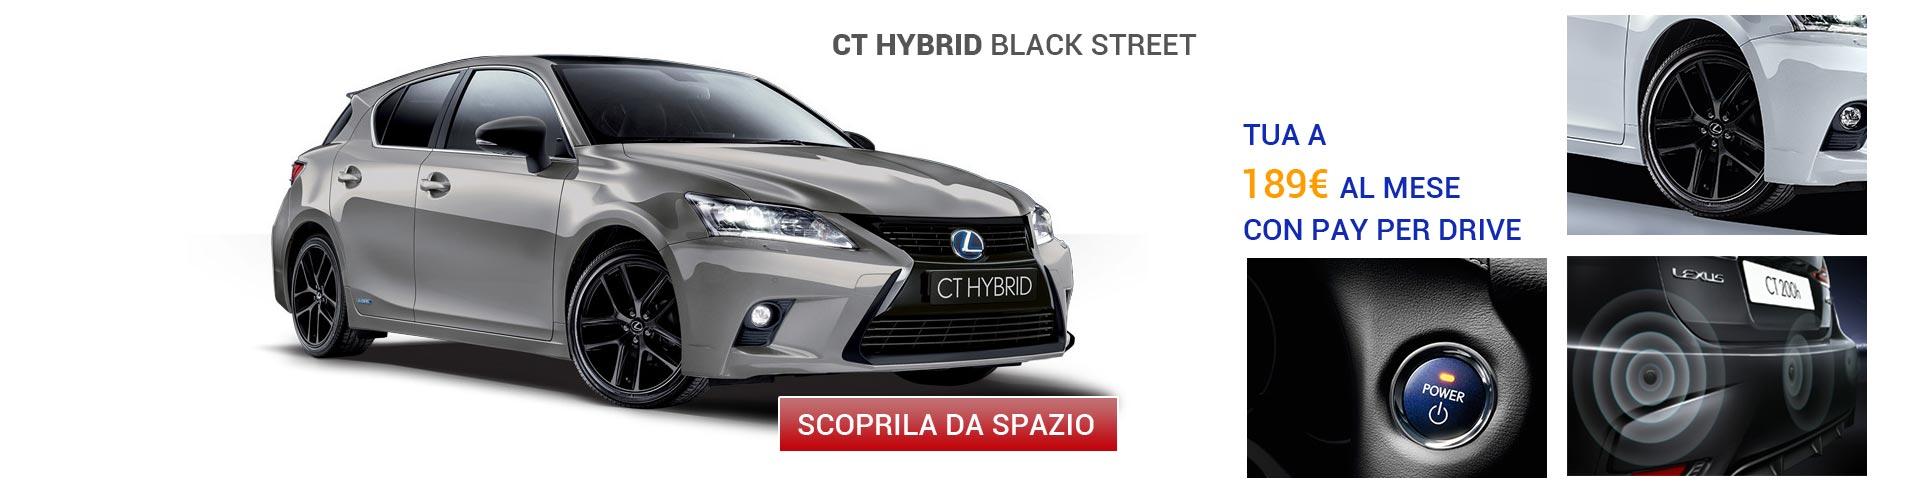 Lexus CT Hybrid Black Street